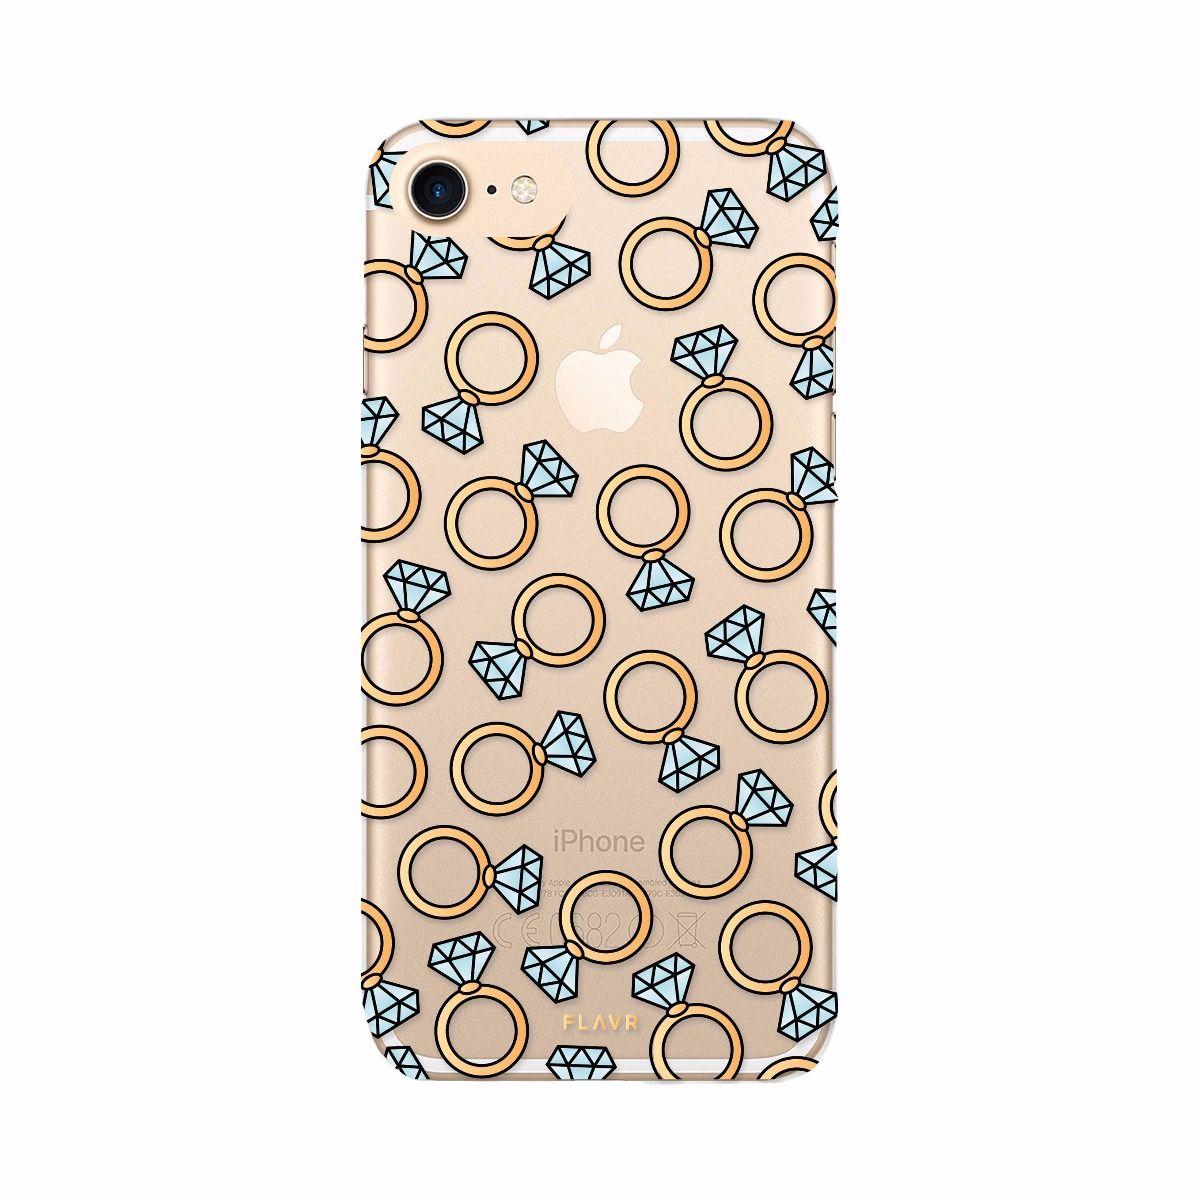 Ochranný kryt pro iPhone 7 / 8 - FLAVR, DIAMOND RINGS